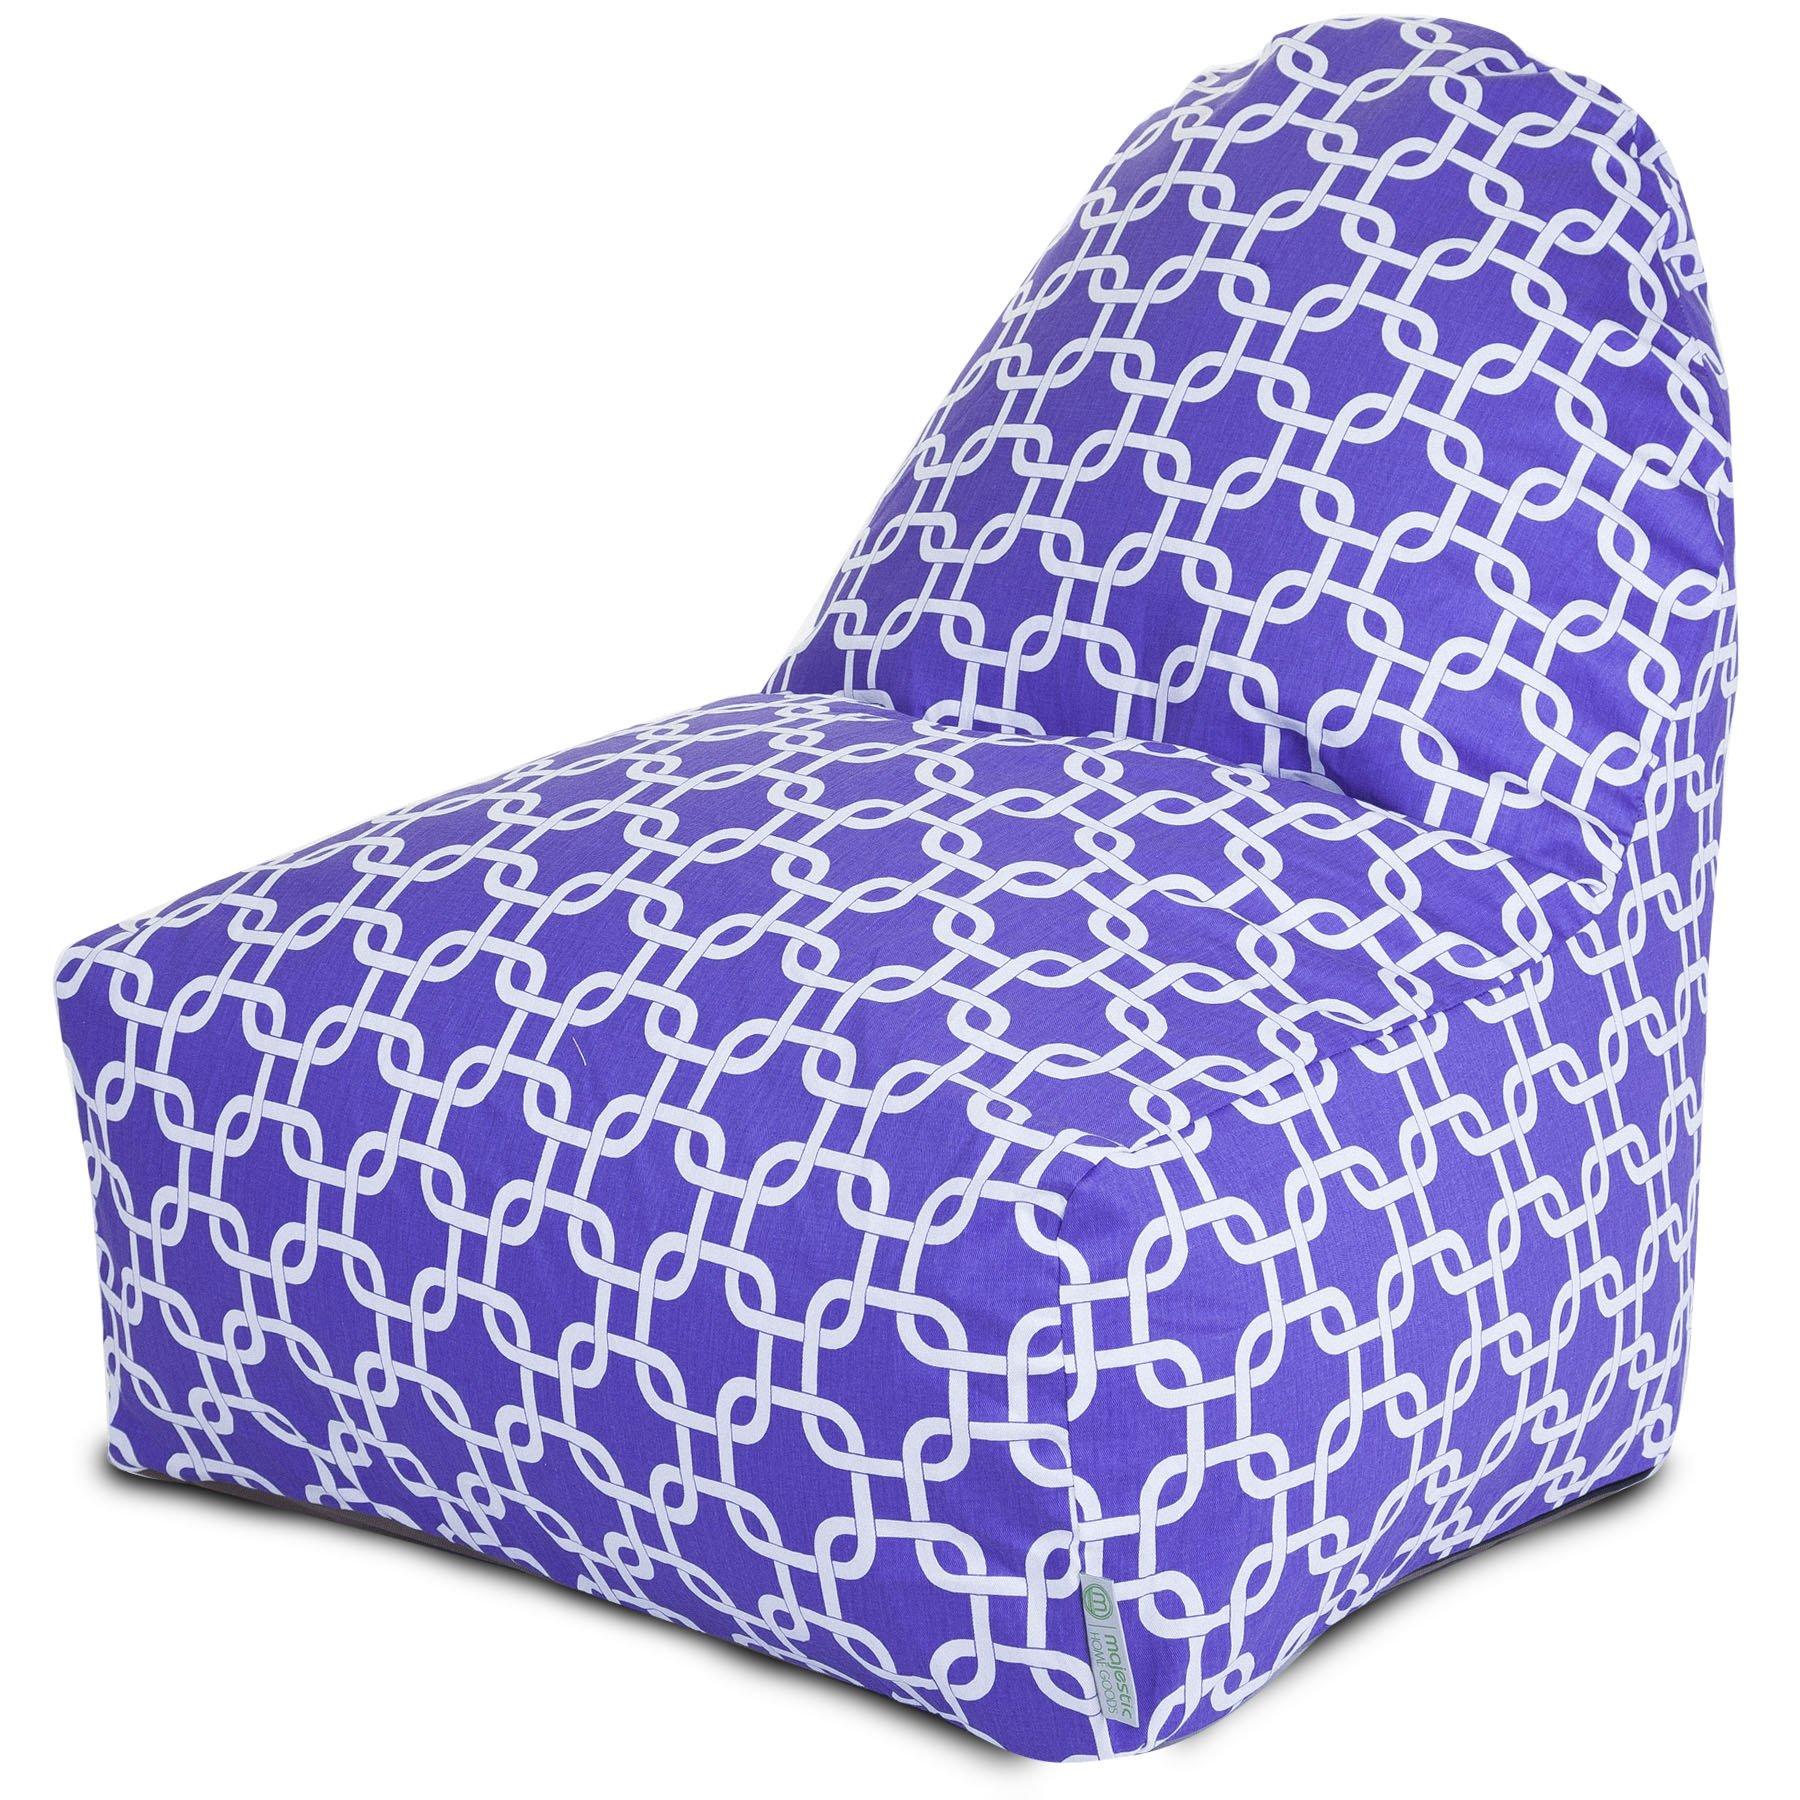 Majestic Home Goods Purple Links Kick-It Chair